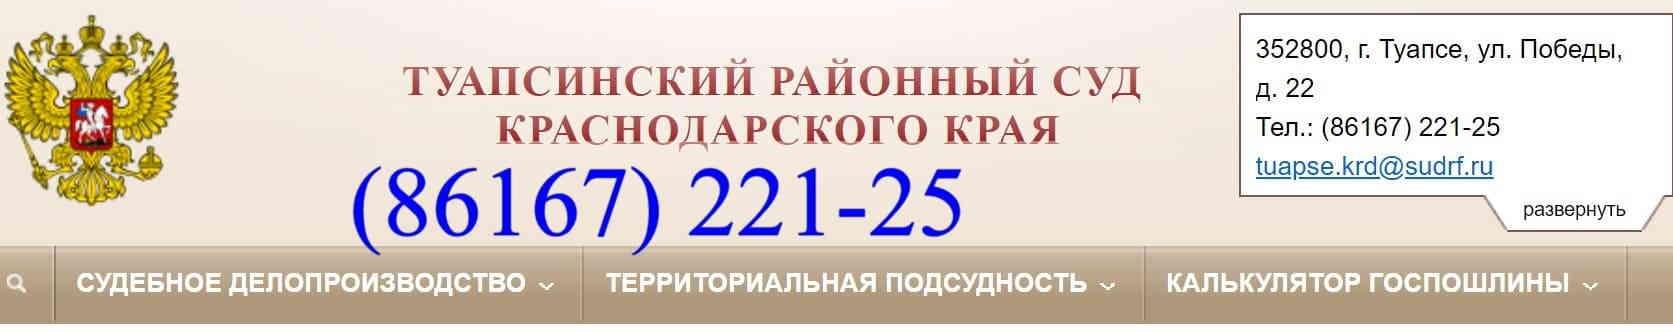 Туапсинский районный суд сайт